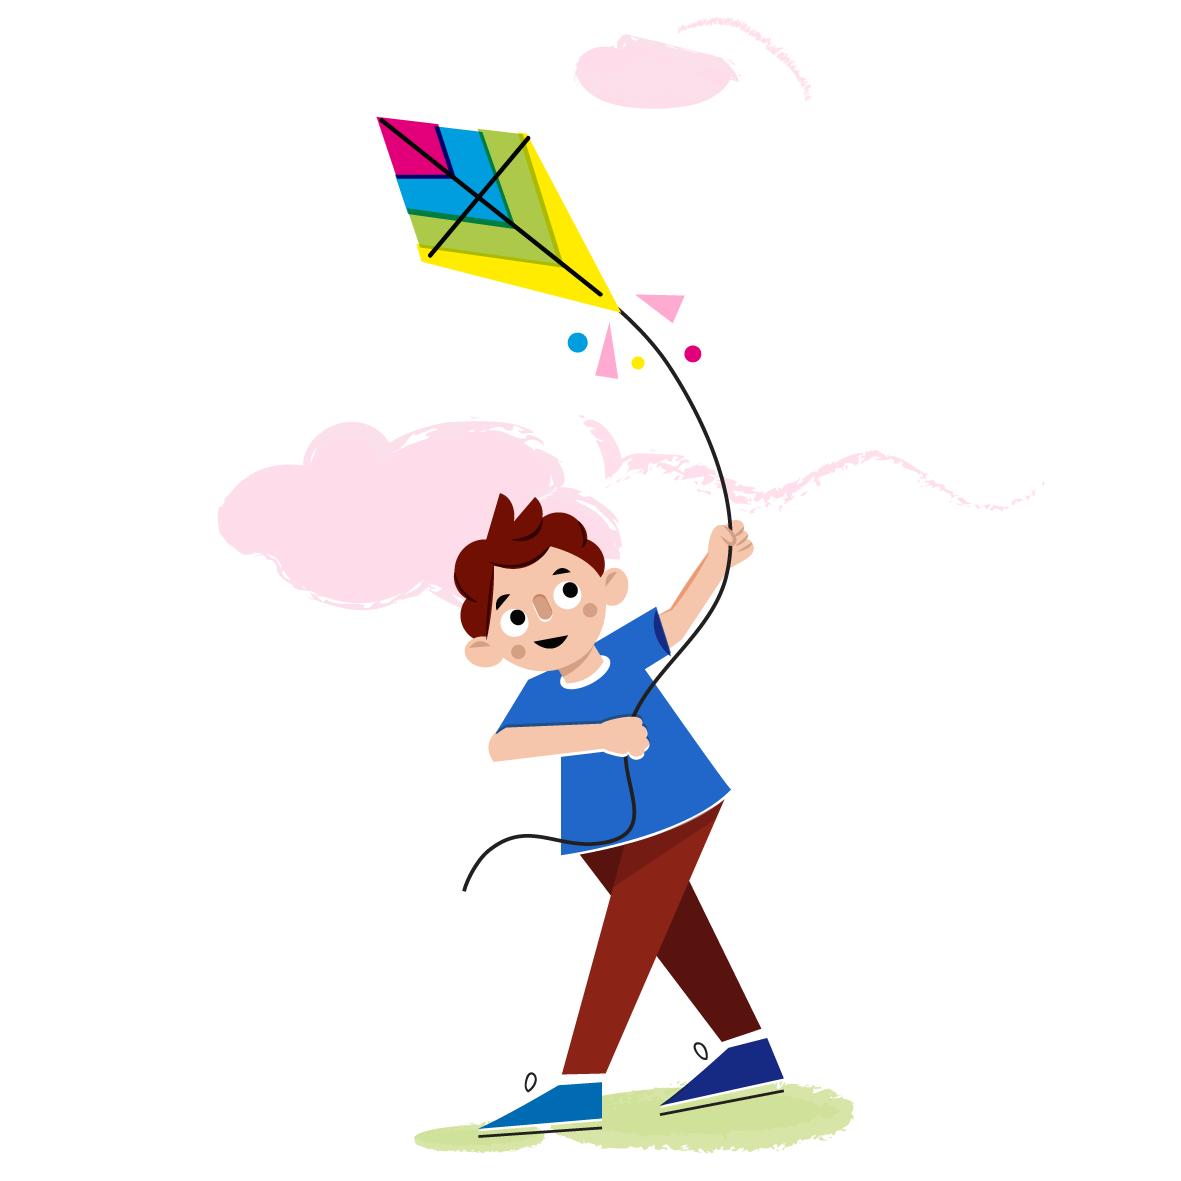 Flying kite - Vector Illustration © Emeline Barrea, All rights reserved